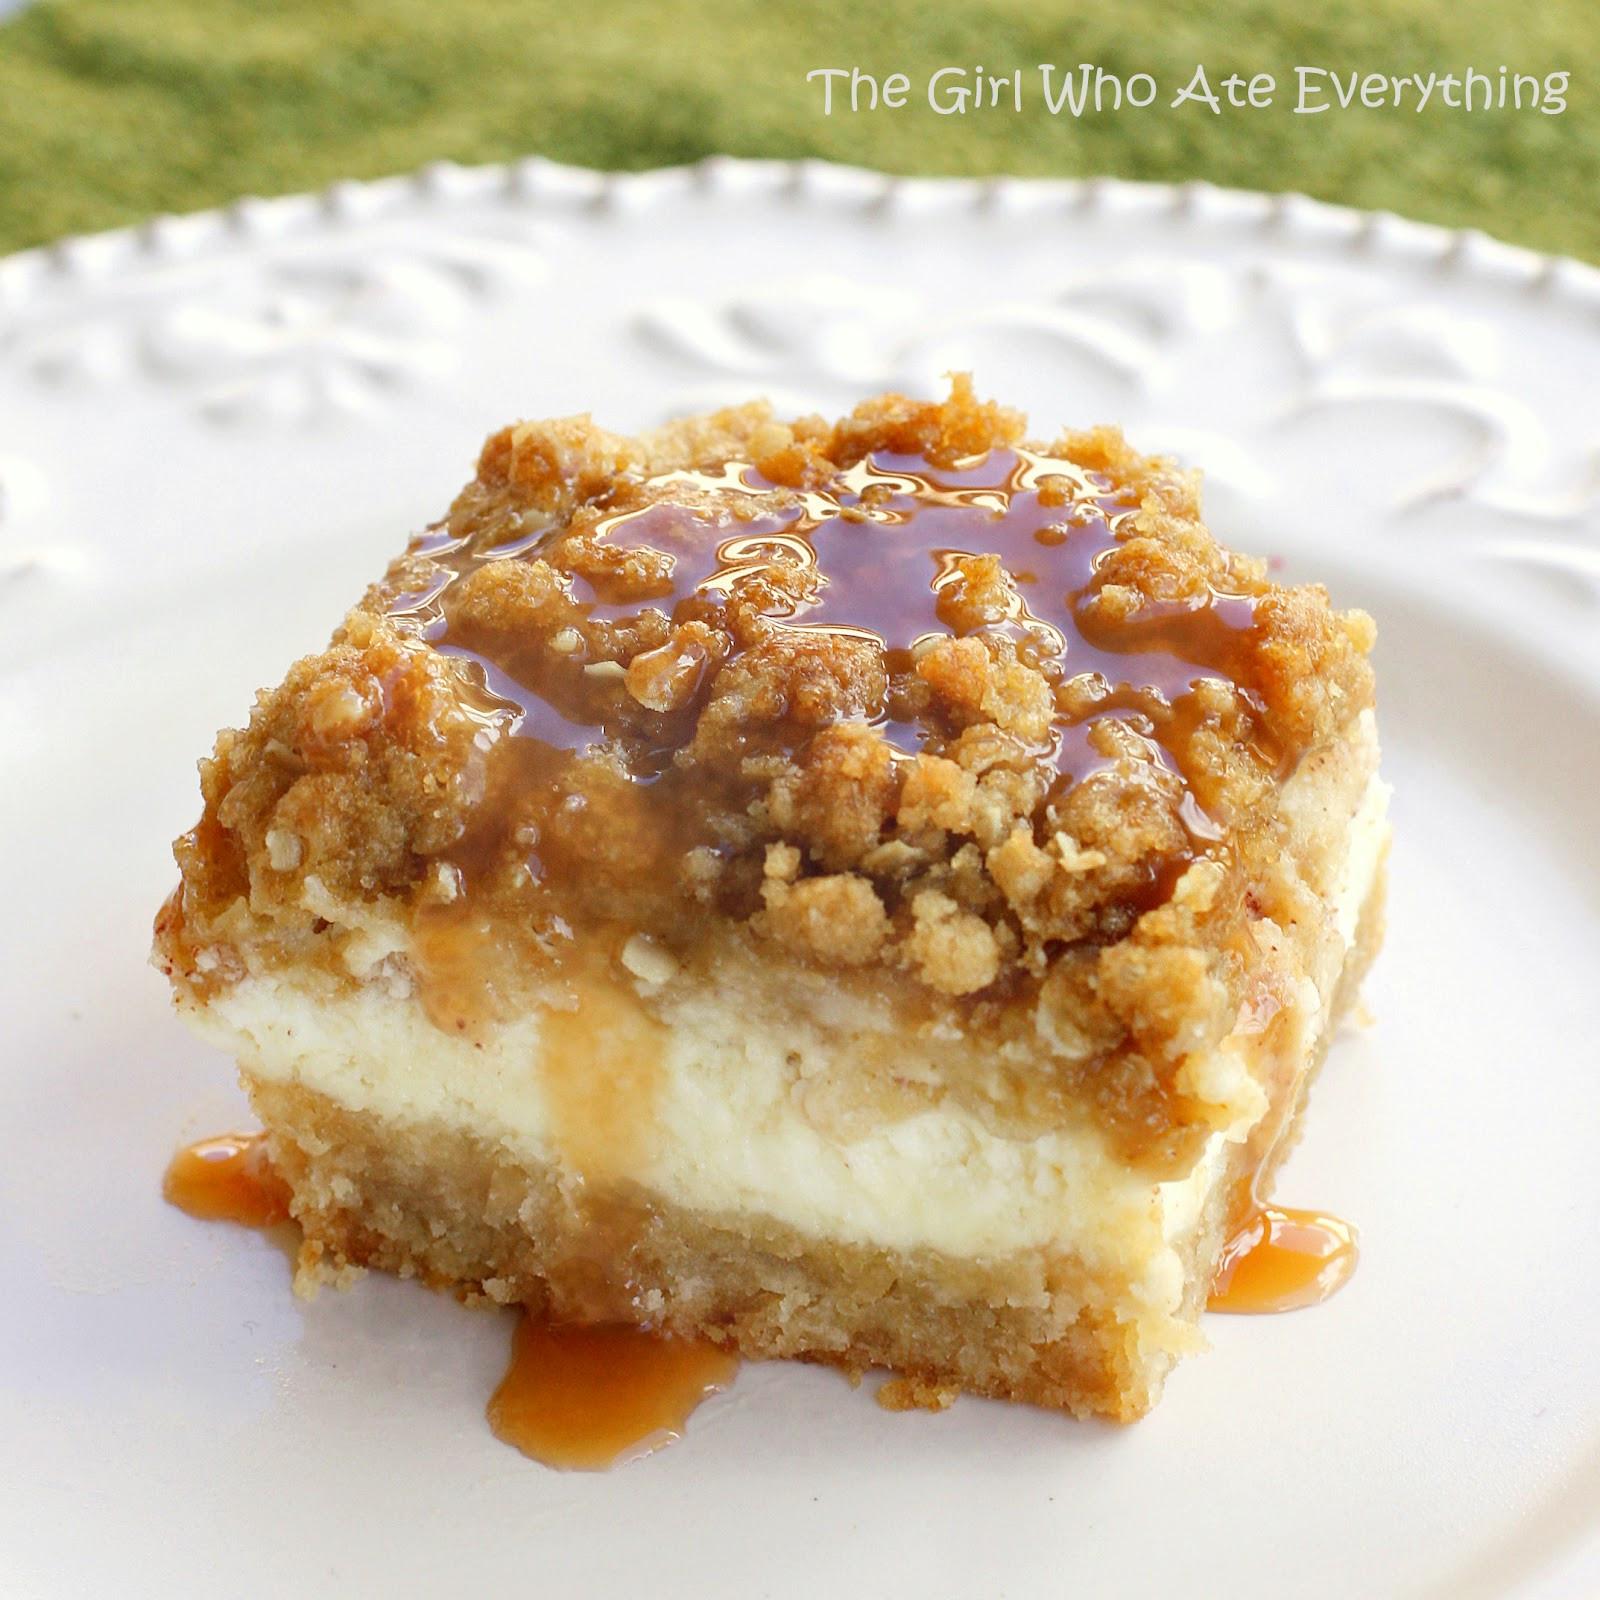 Caramel Apple Dessert  Caramel Apple Cheesecake Bars